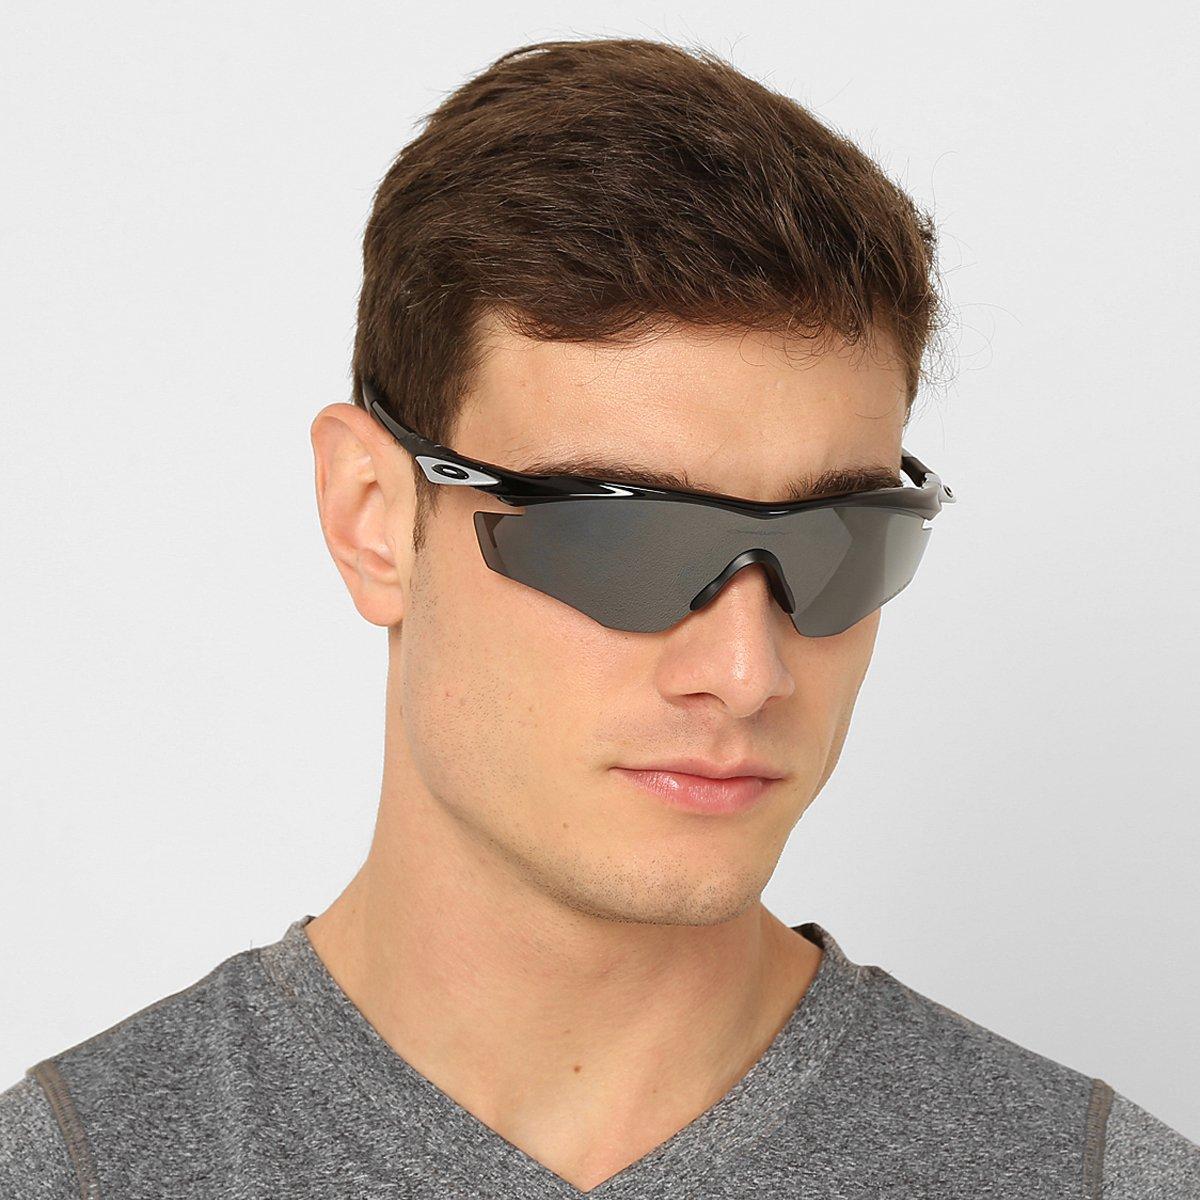 65f6b6ac6949b Óculos Oakley M2 Frame - Iridium Polarizado - Compre Agora   Netshoes